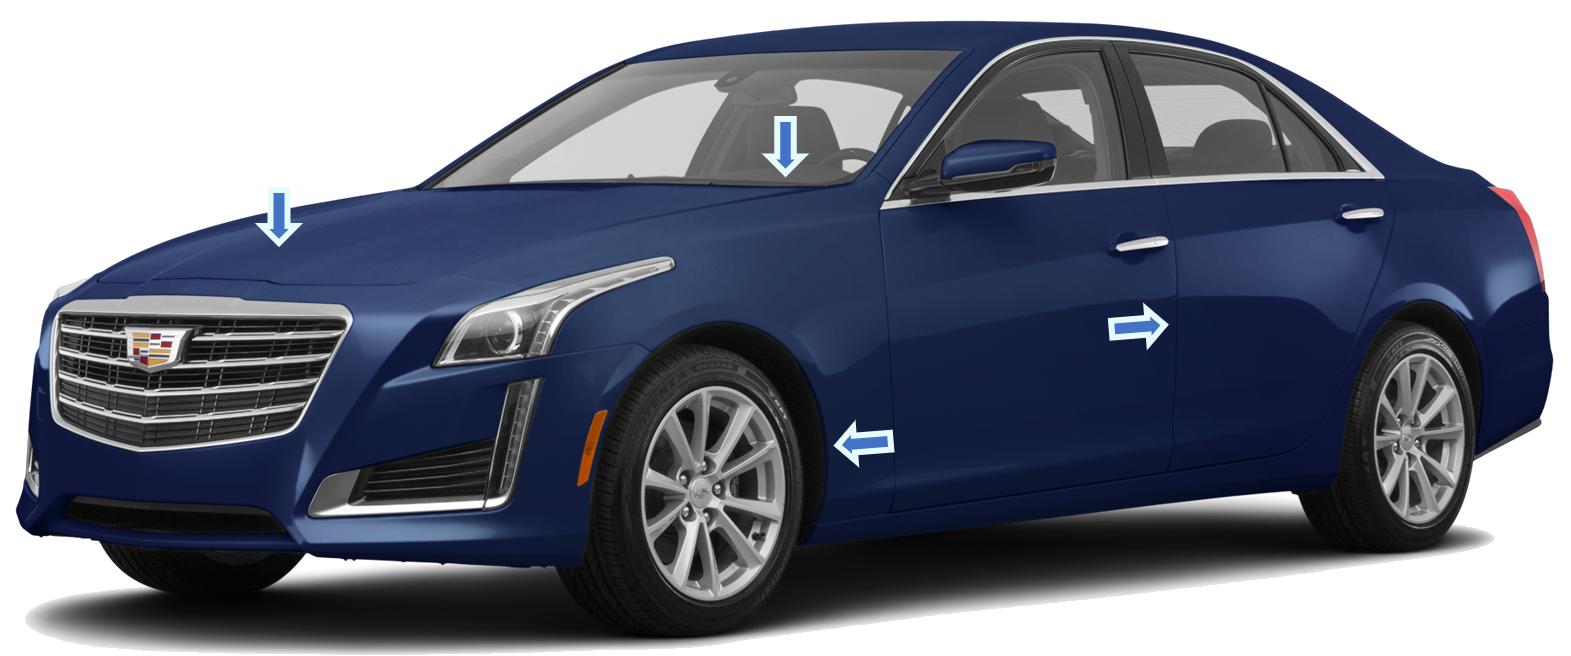 Cadillac recalls